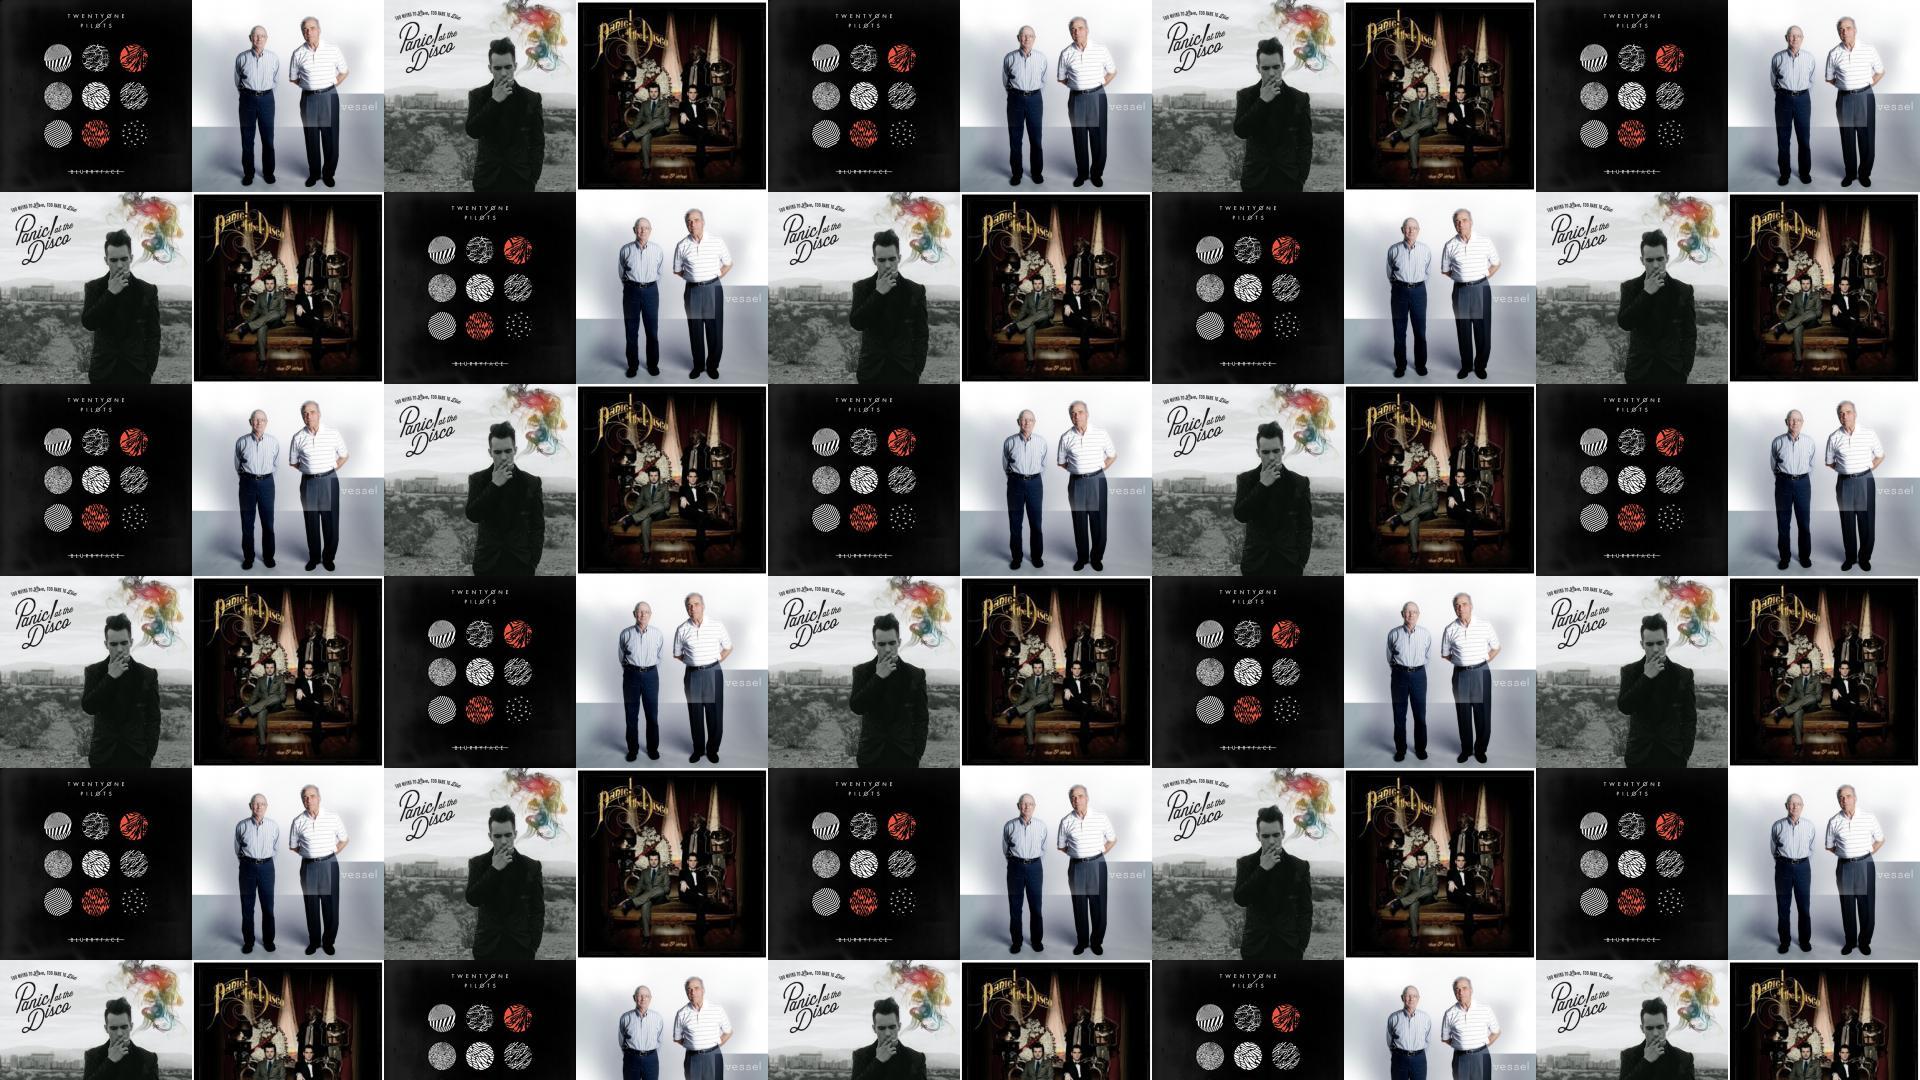 Twenty One Pilots Blurryface Vessel Panic At Disco Wallpaper Tiled Desktop